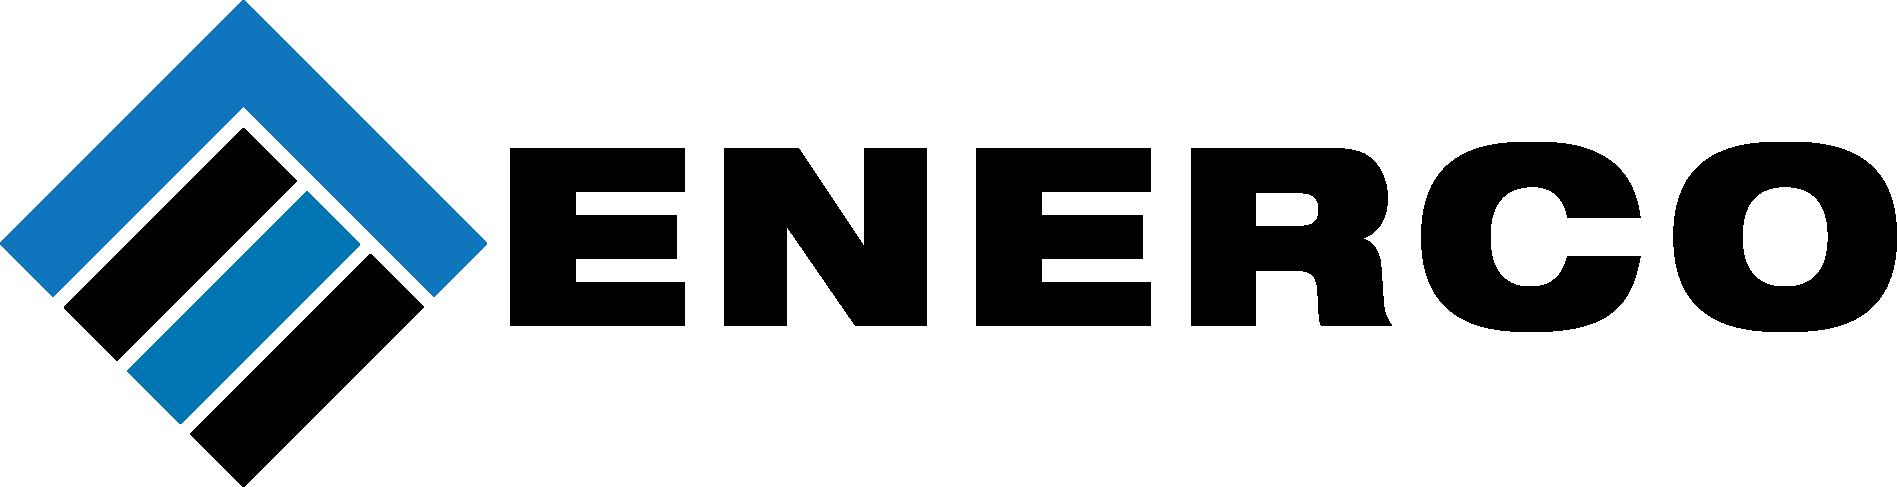 Propane Low Pressure Regulator (up to 90k BTU) Clamshell